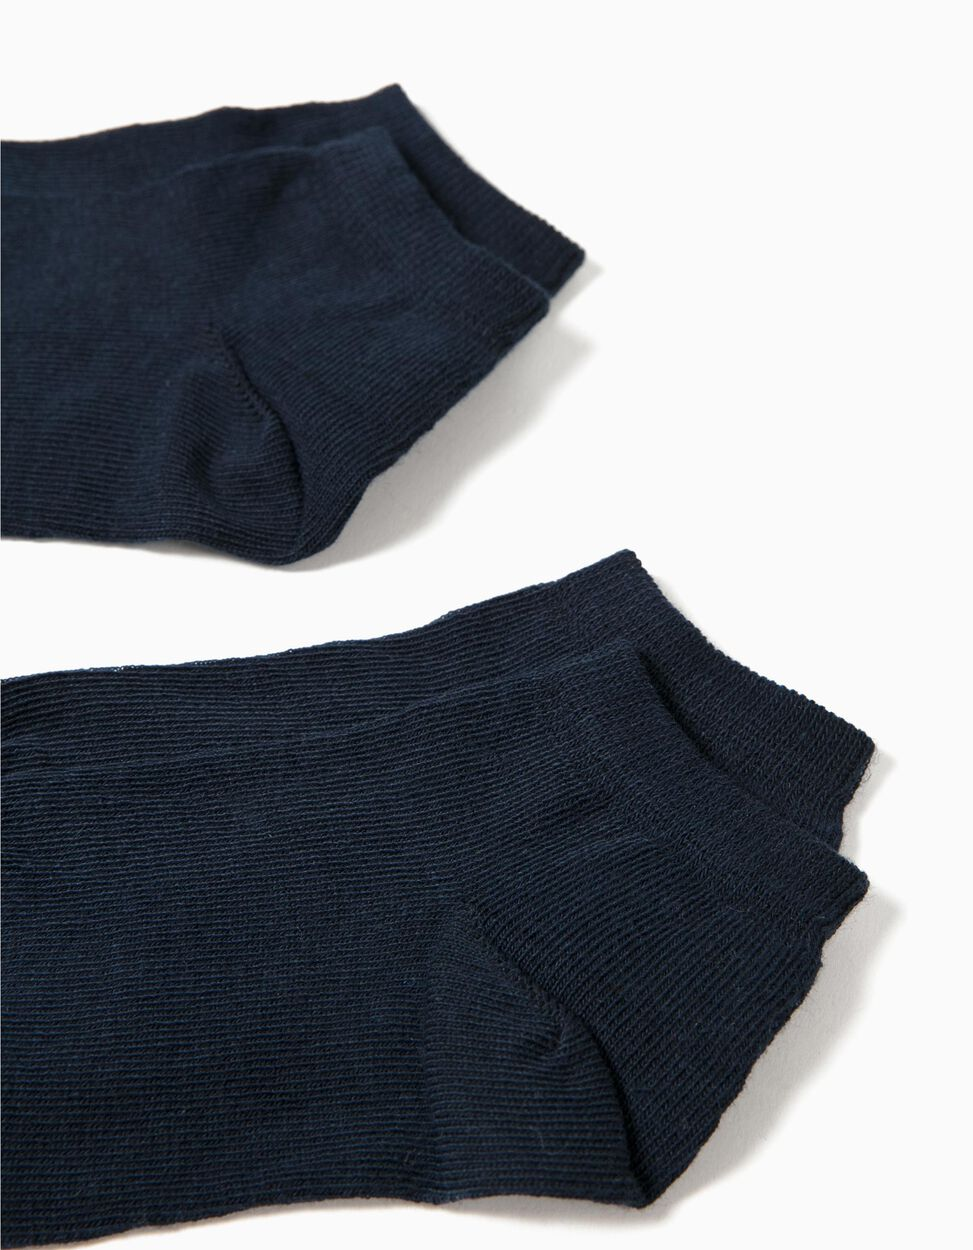 Pack 2 pares de calcetines invisibles